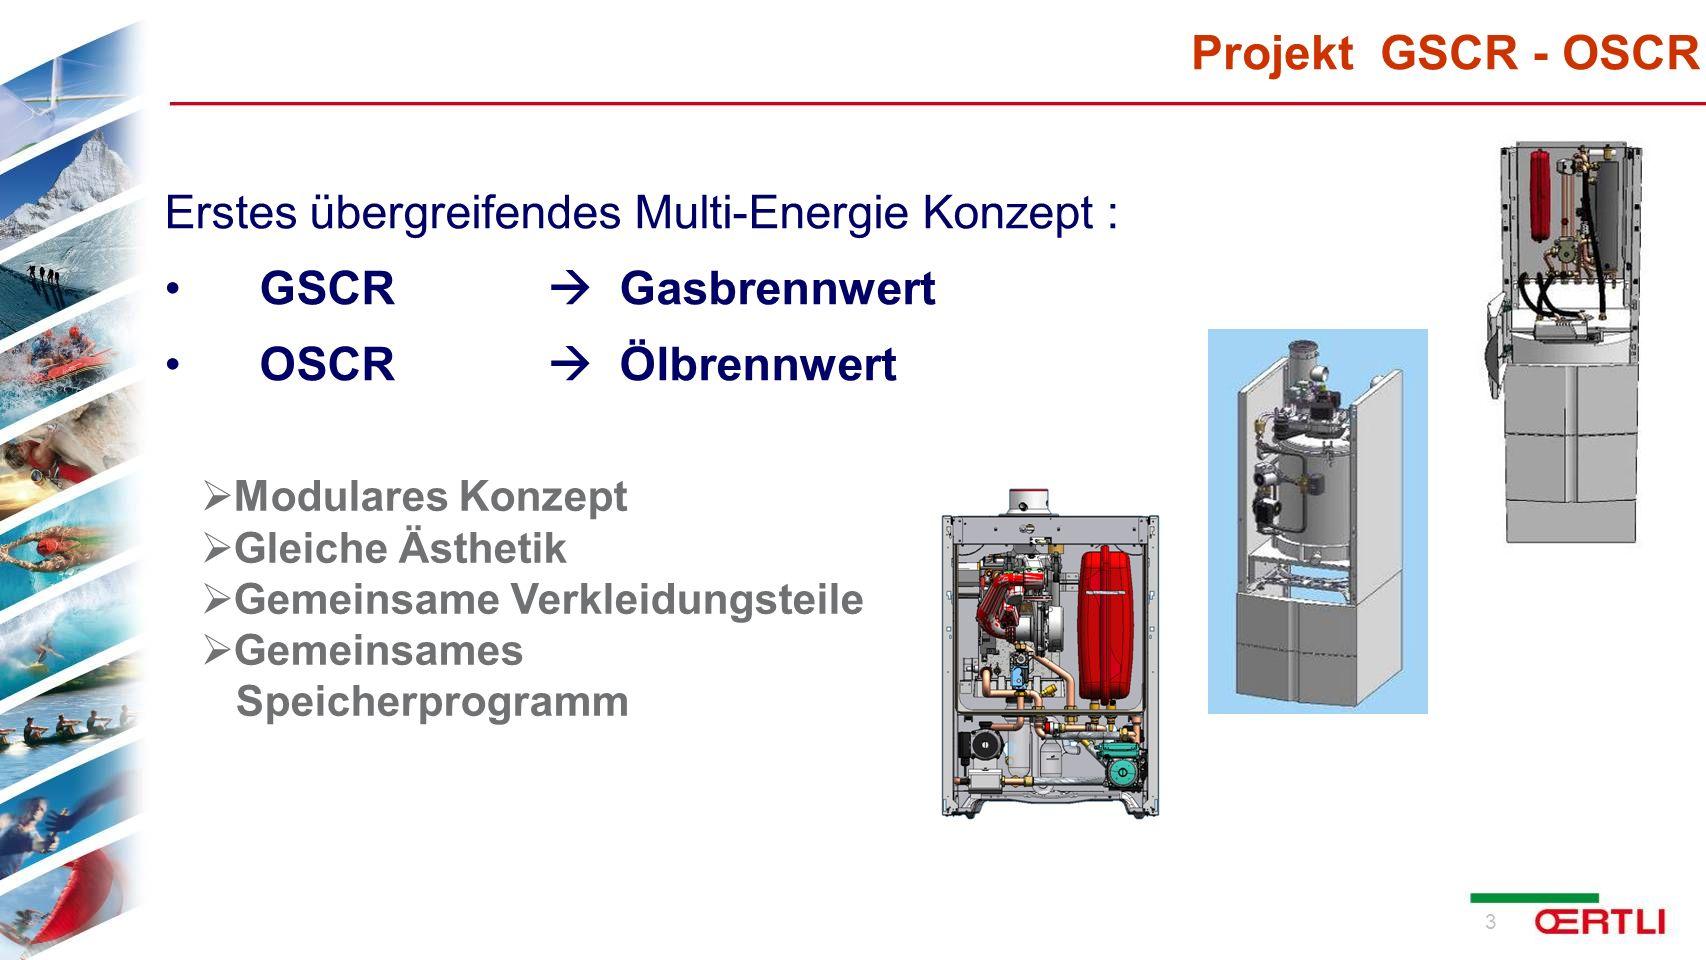 Projekt GSCR - OSCR Erstes übergreifendes Multi-Energie Konzept :